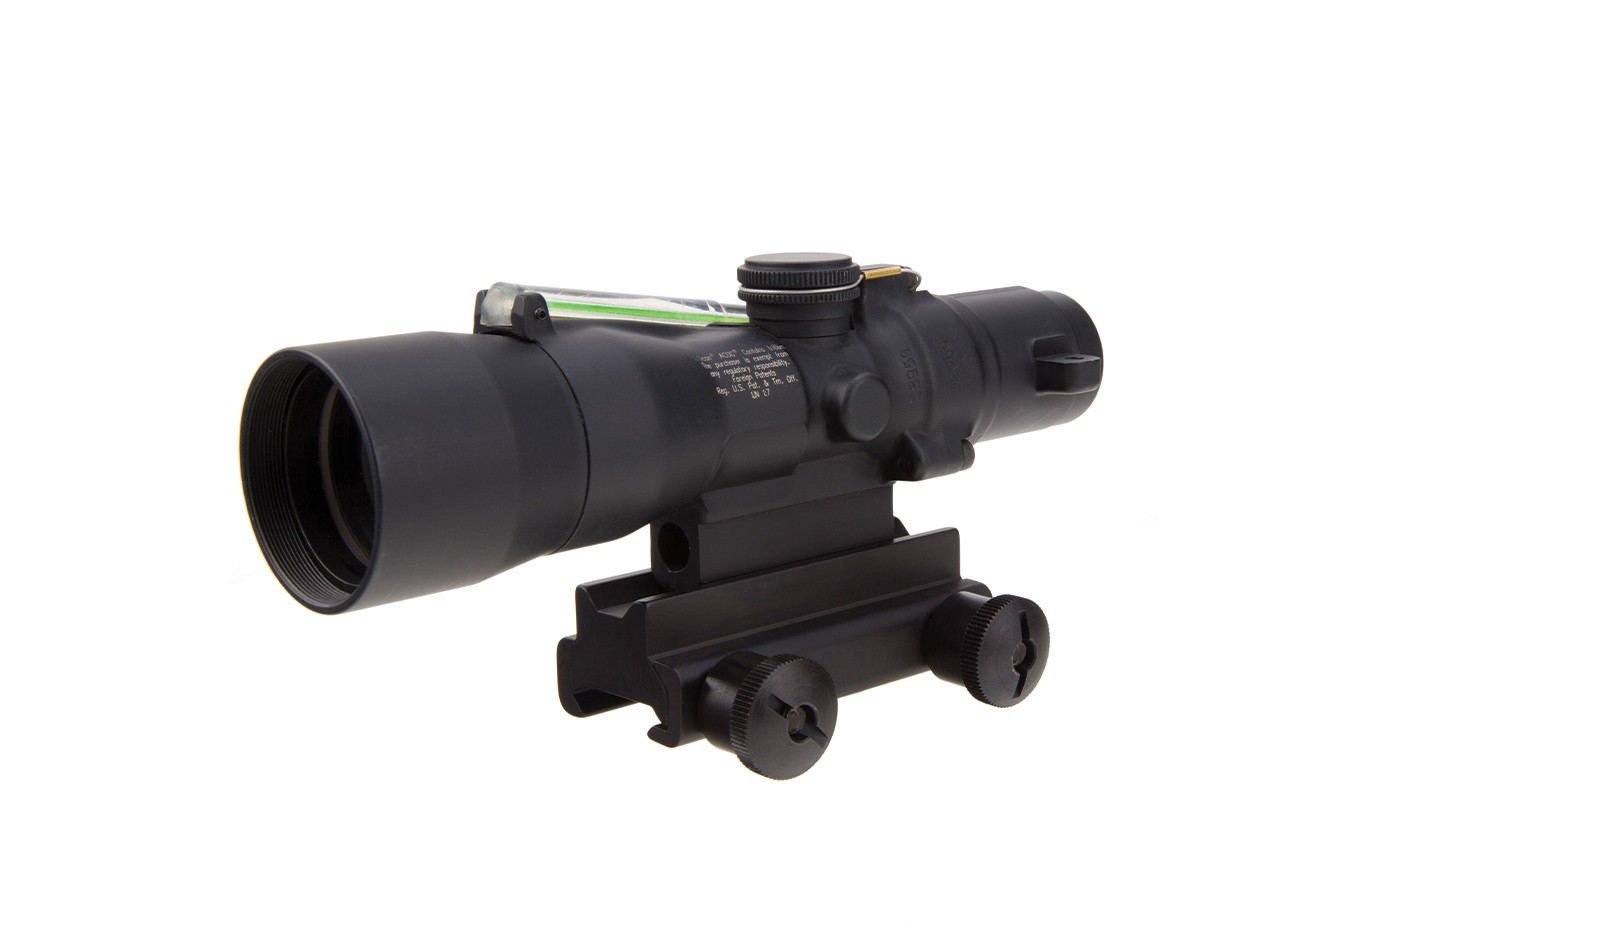 Trijicon ACOG® BAC 3x30 Riflescope - 7.62x51mm / 175 Grain